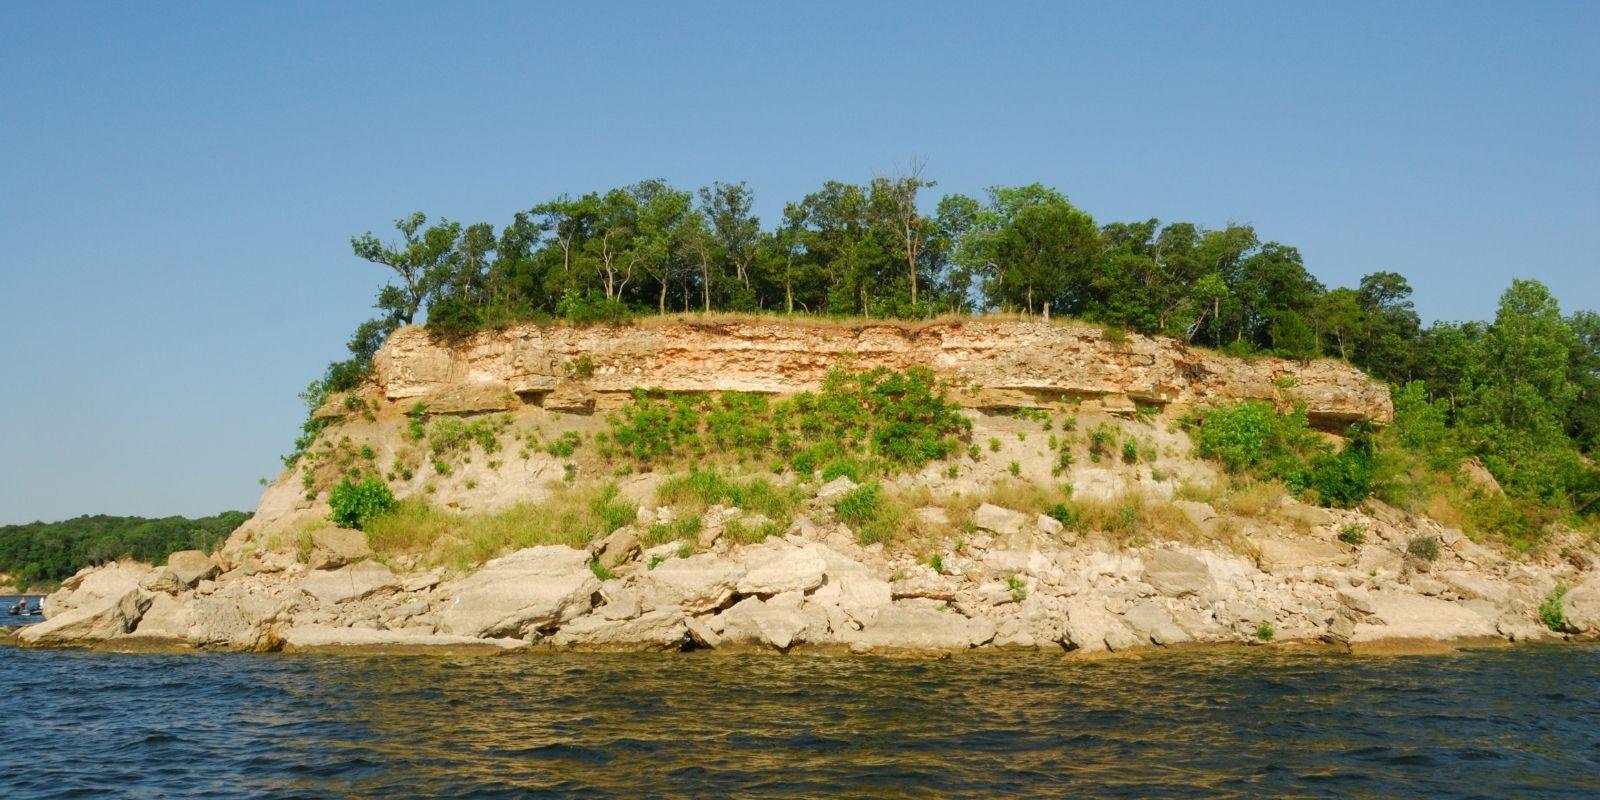 How Big Is Lake Texoma?